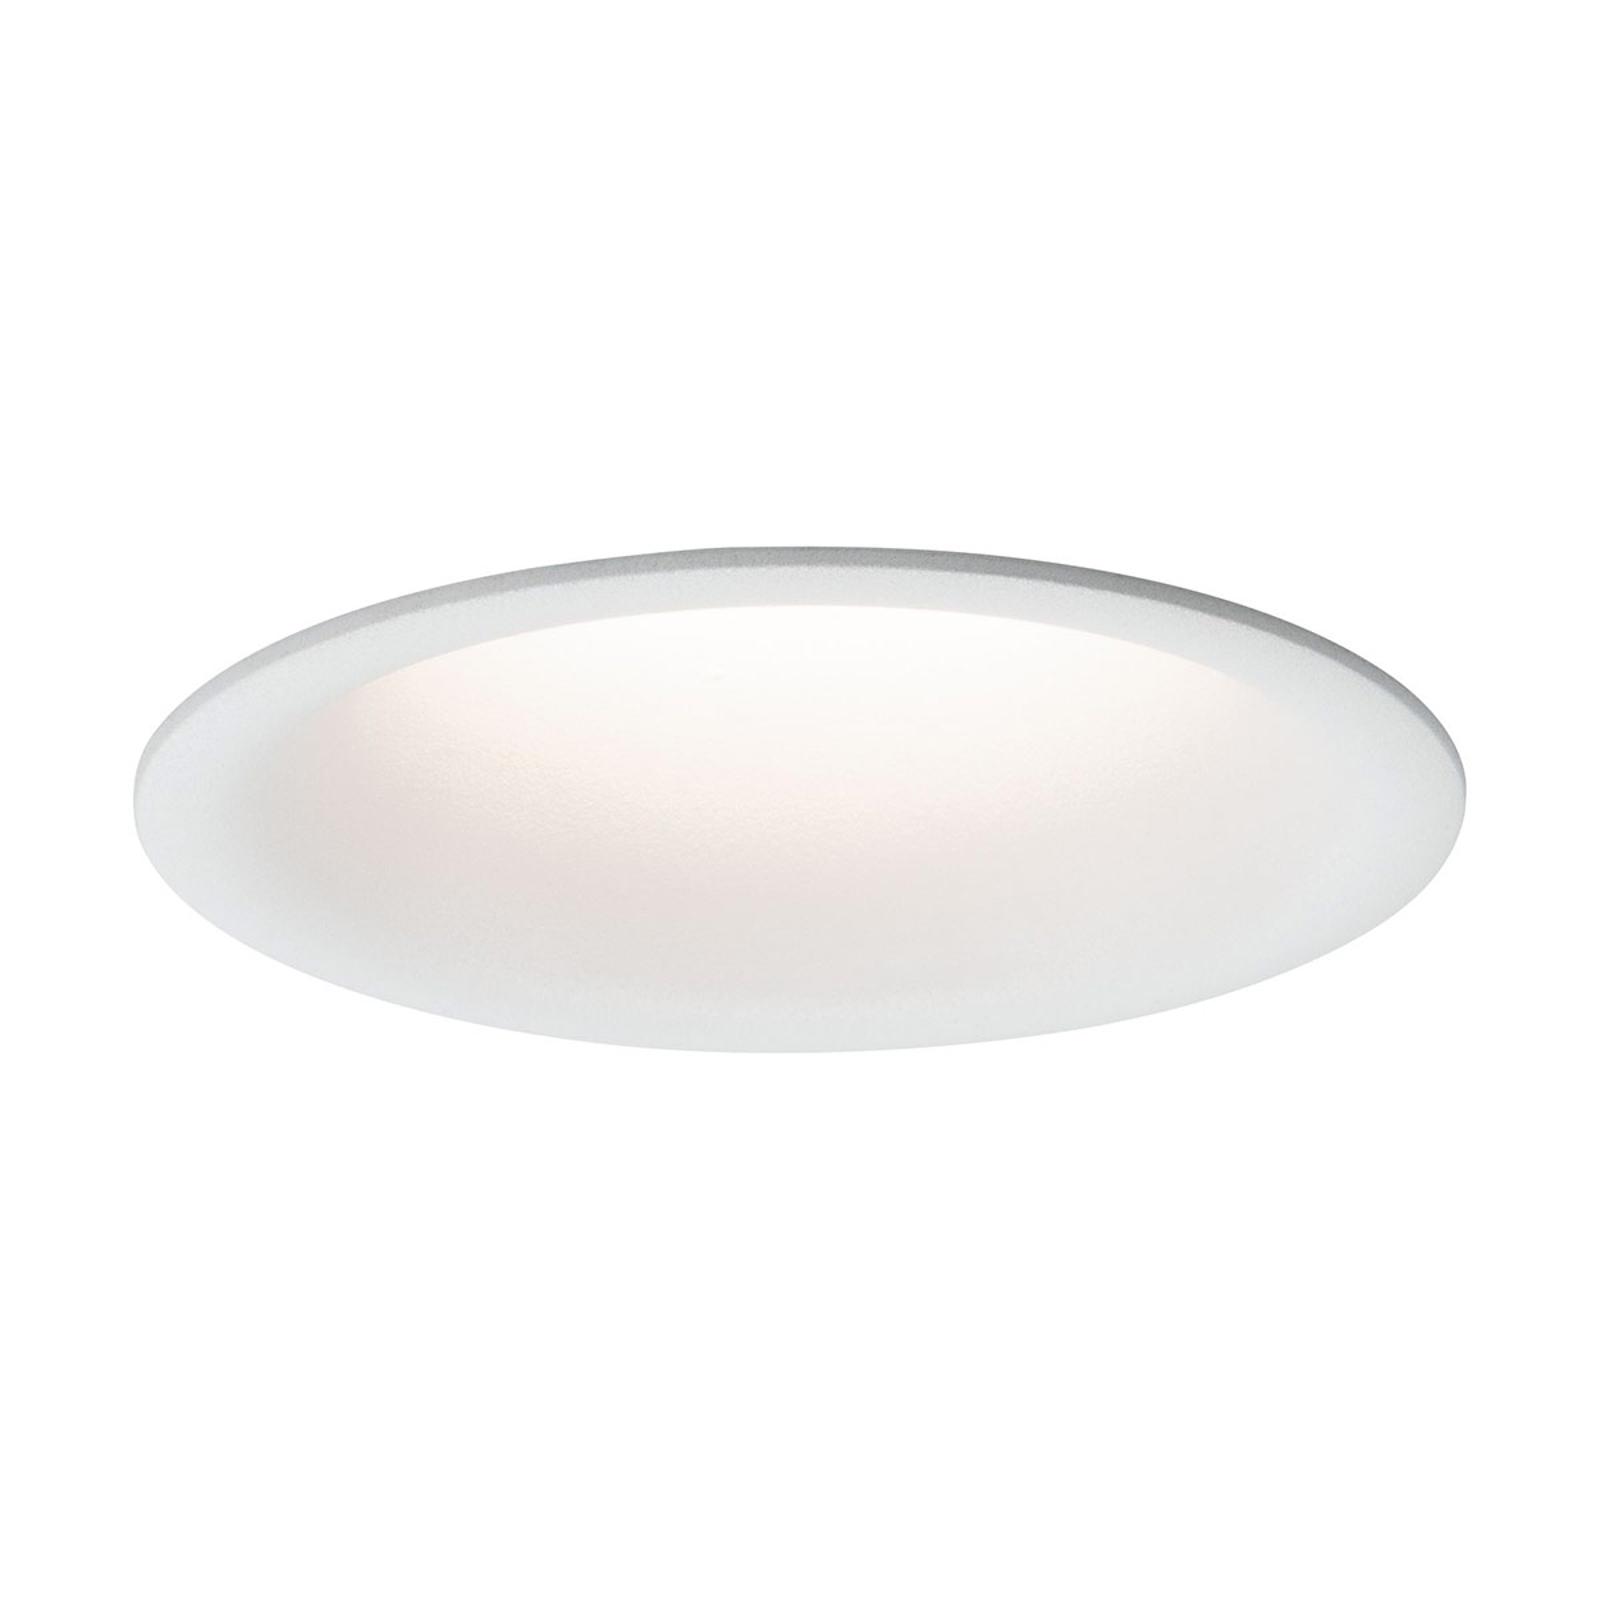 Paulmann Einbaulampe Cymbal